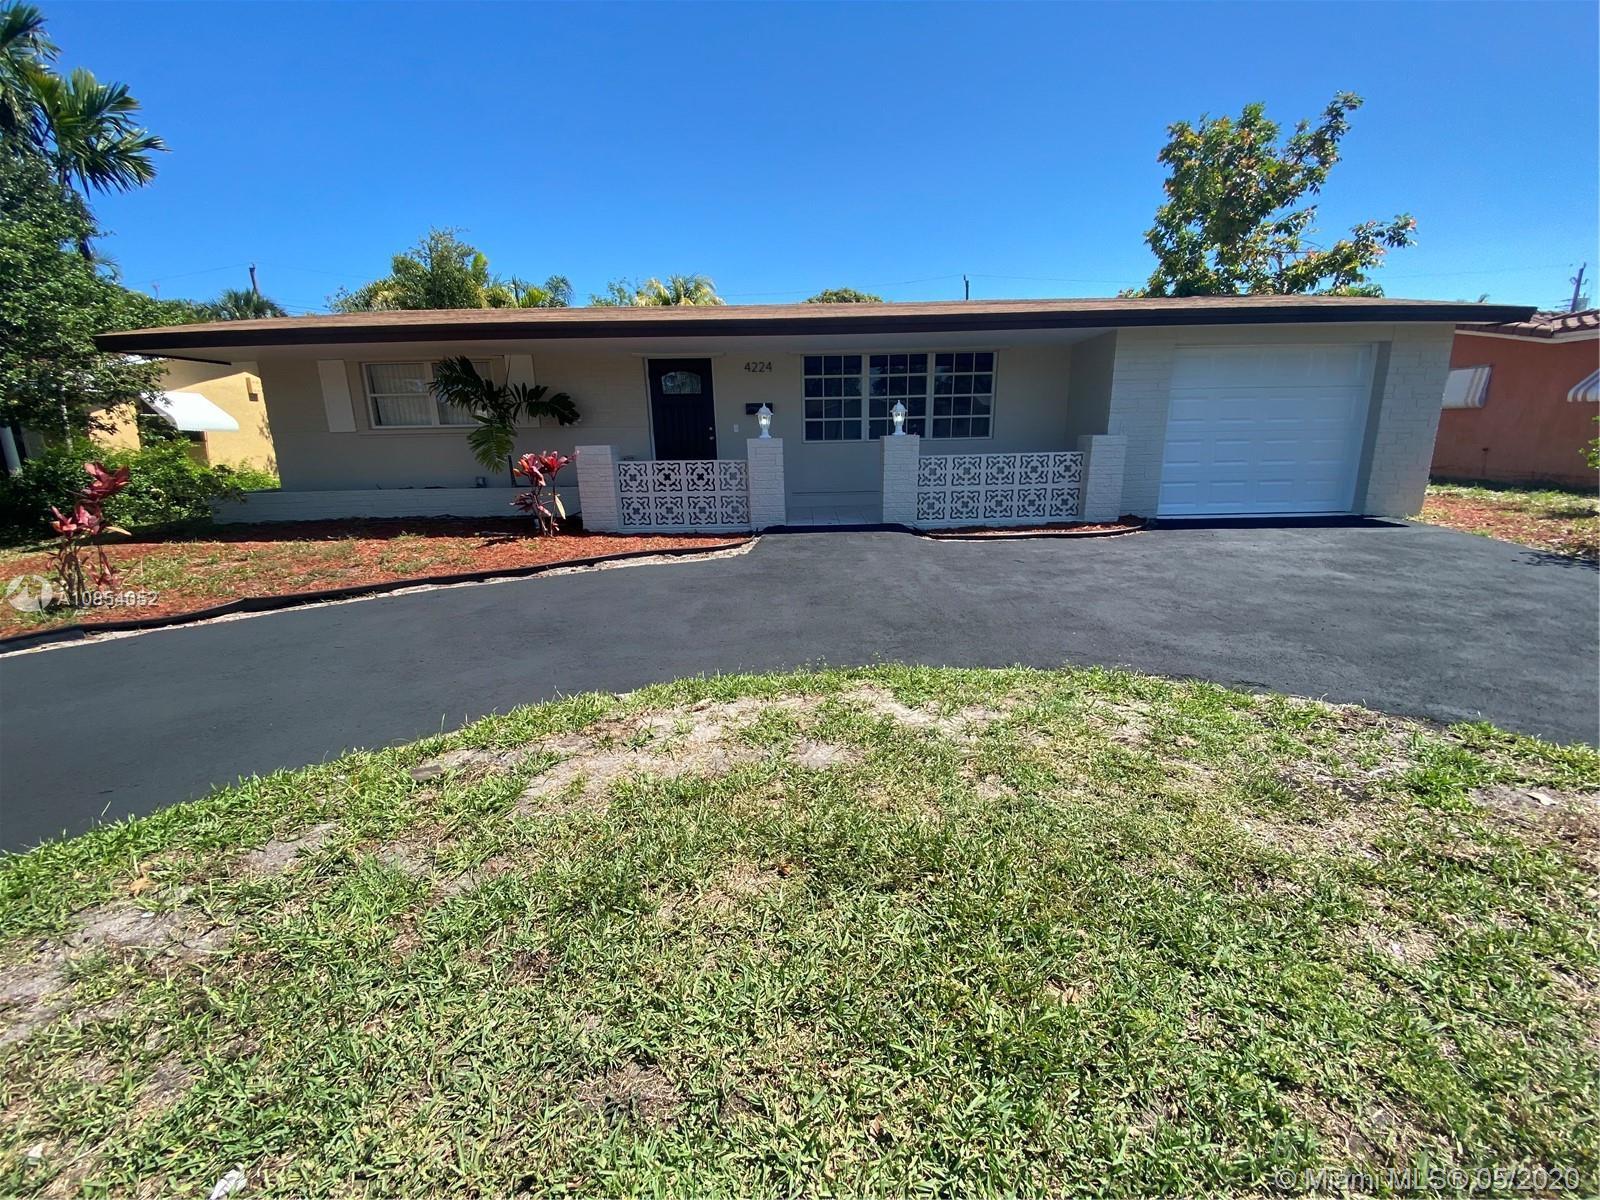 4224 Jefferson St, Hollywood, FL 33021